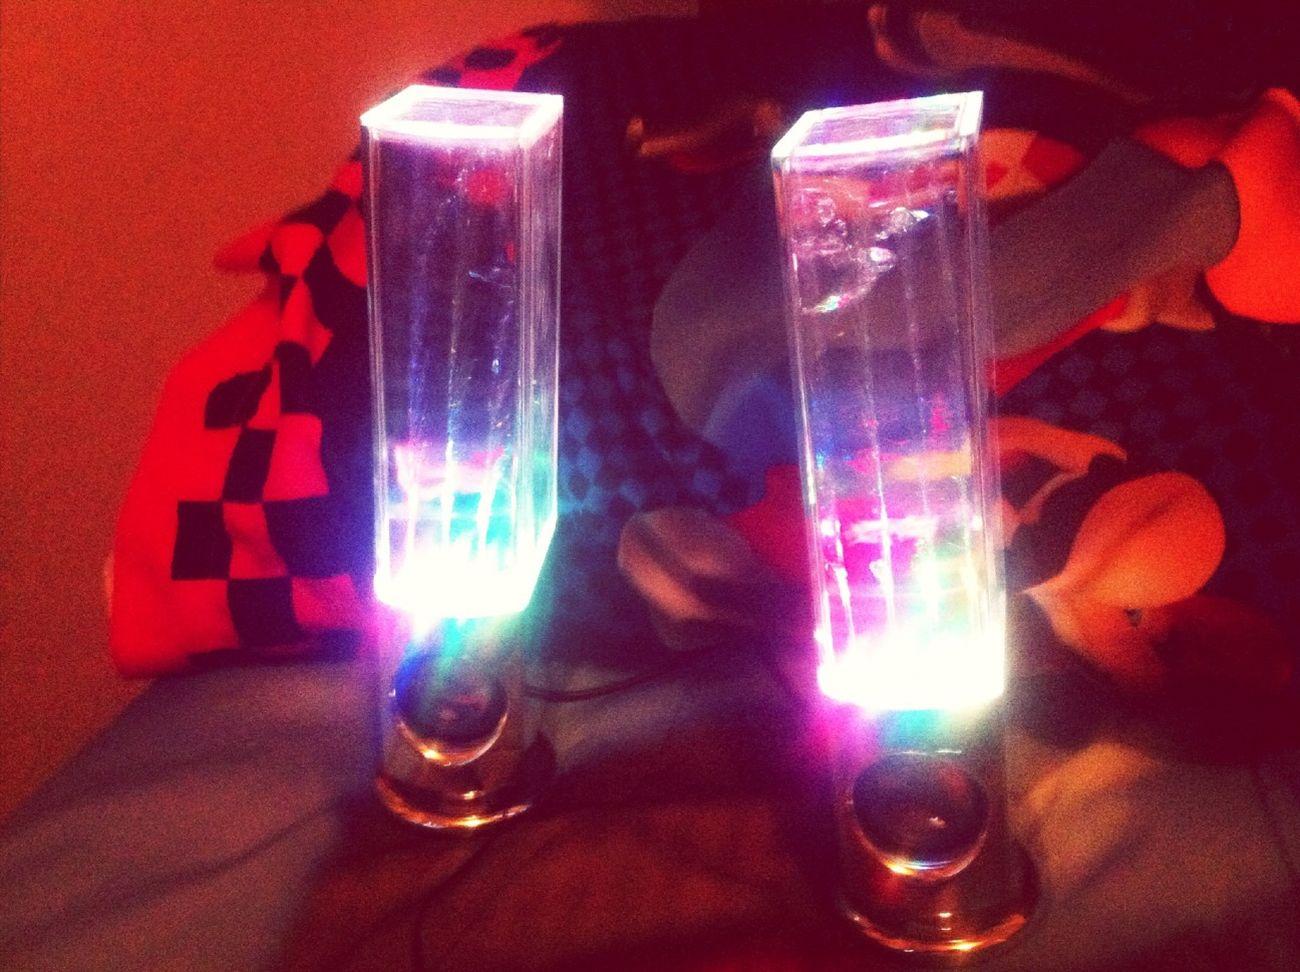 I like my speakers (: